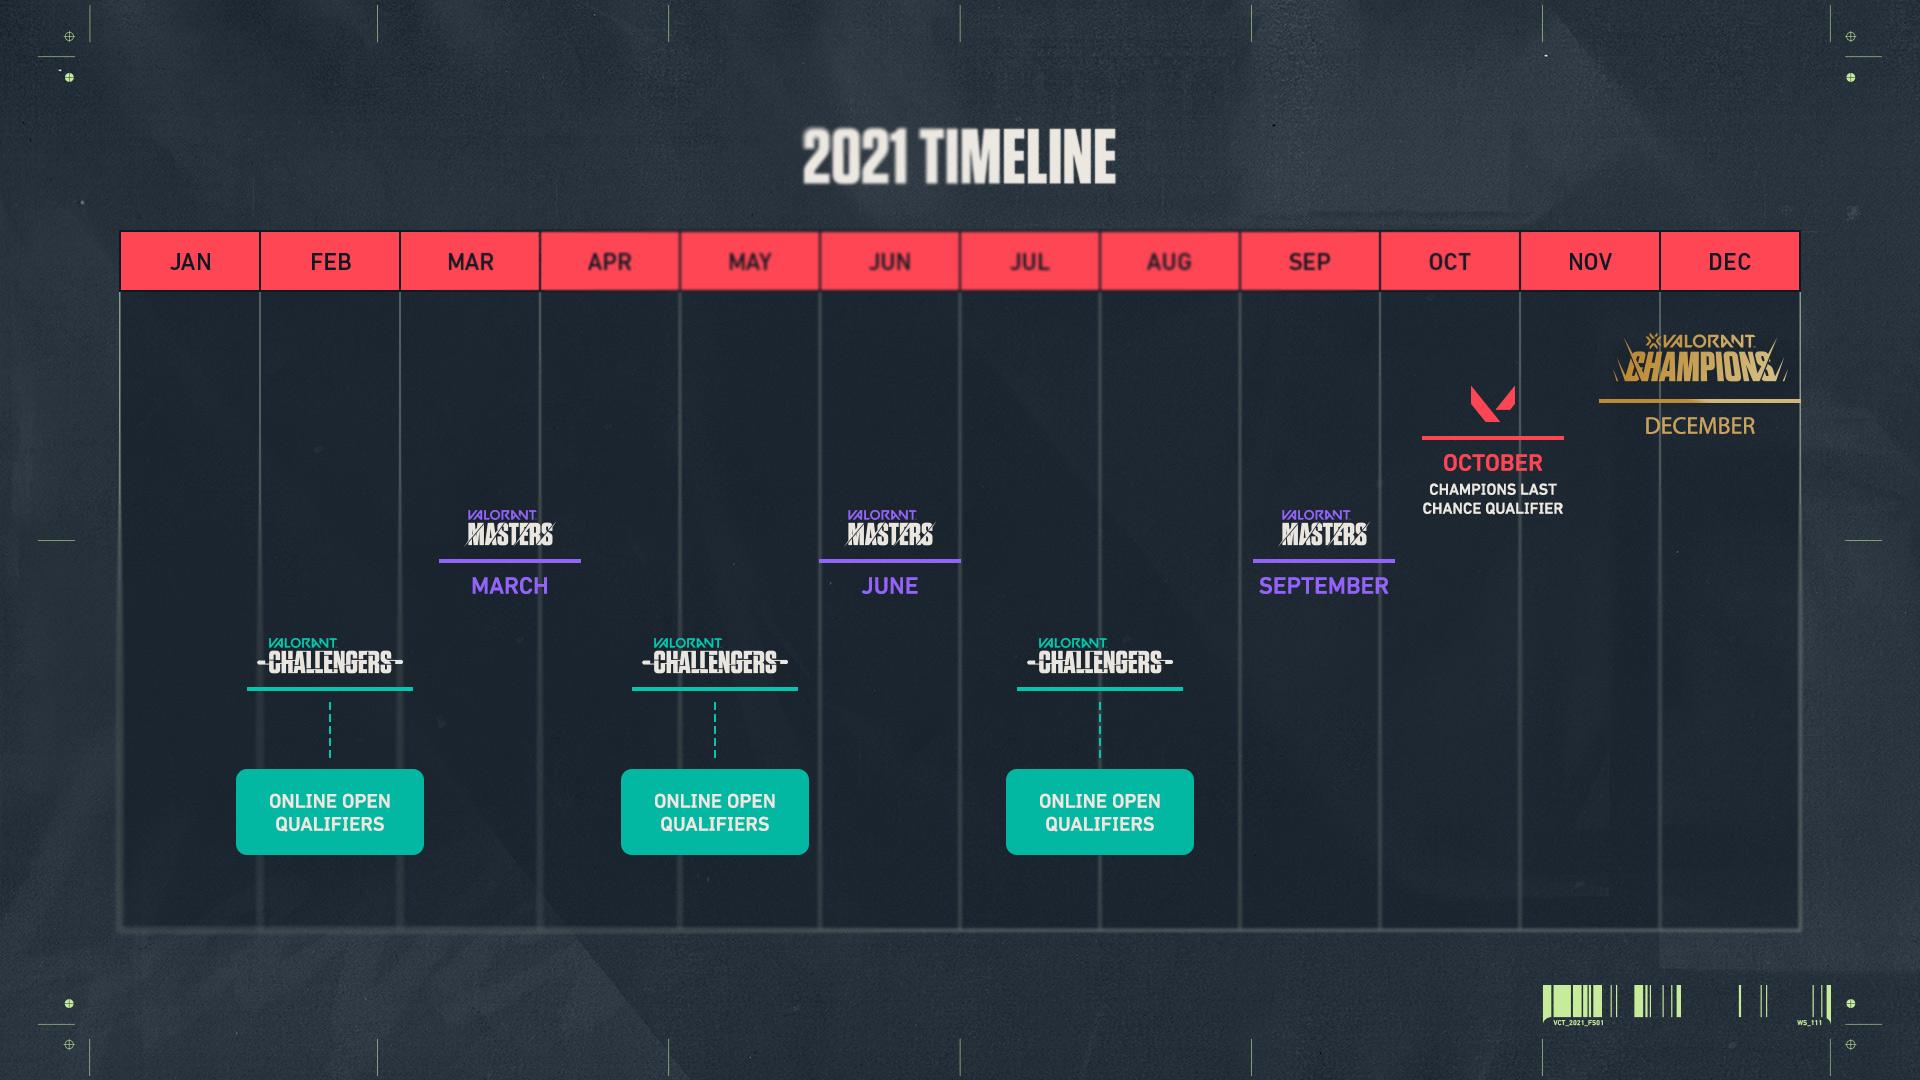 calendrier valorant champions tour